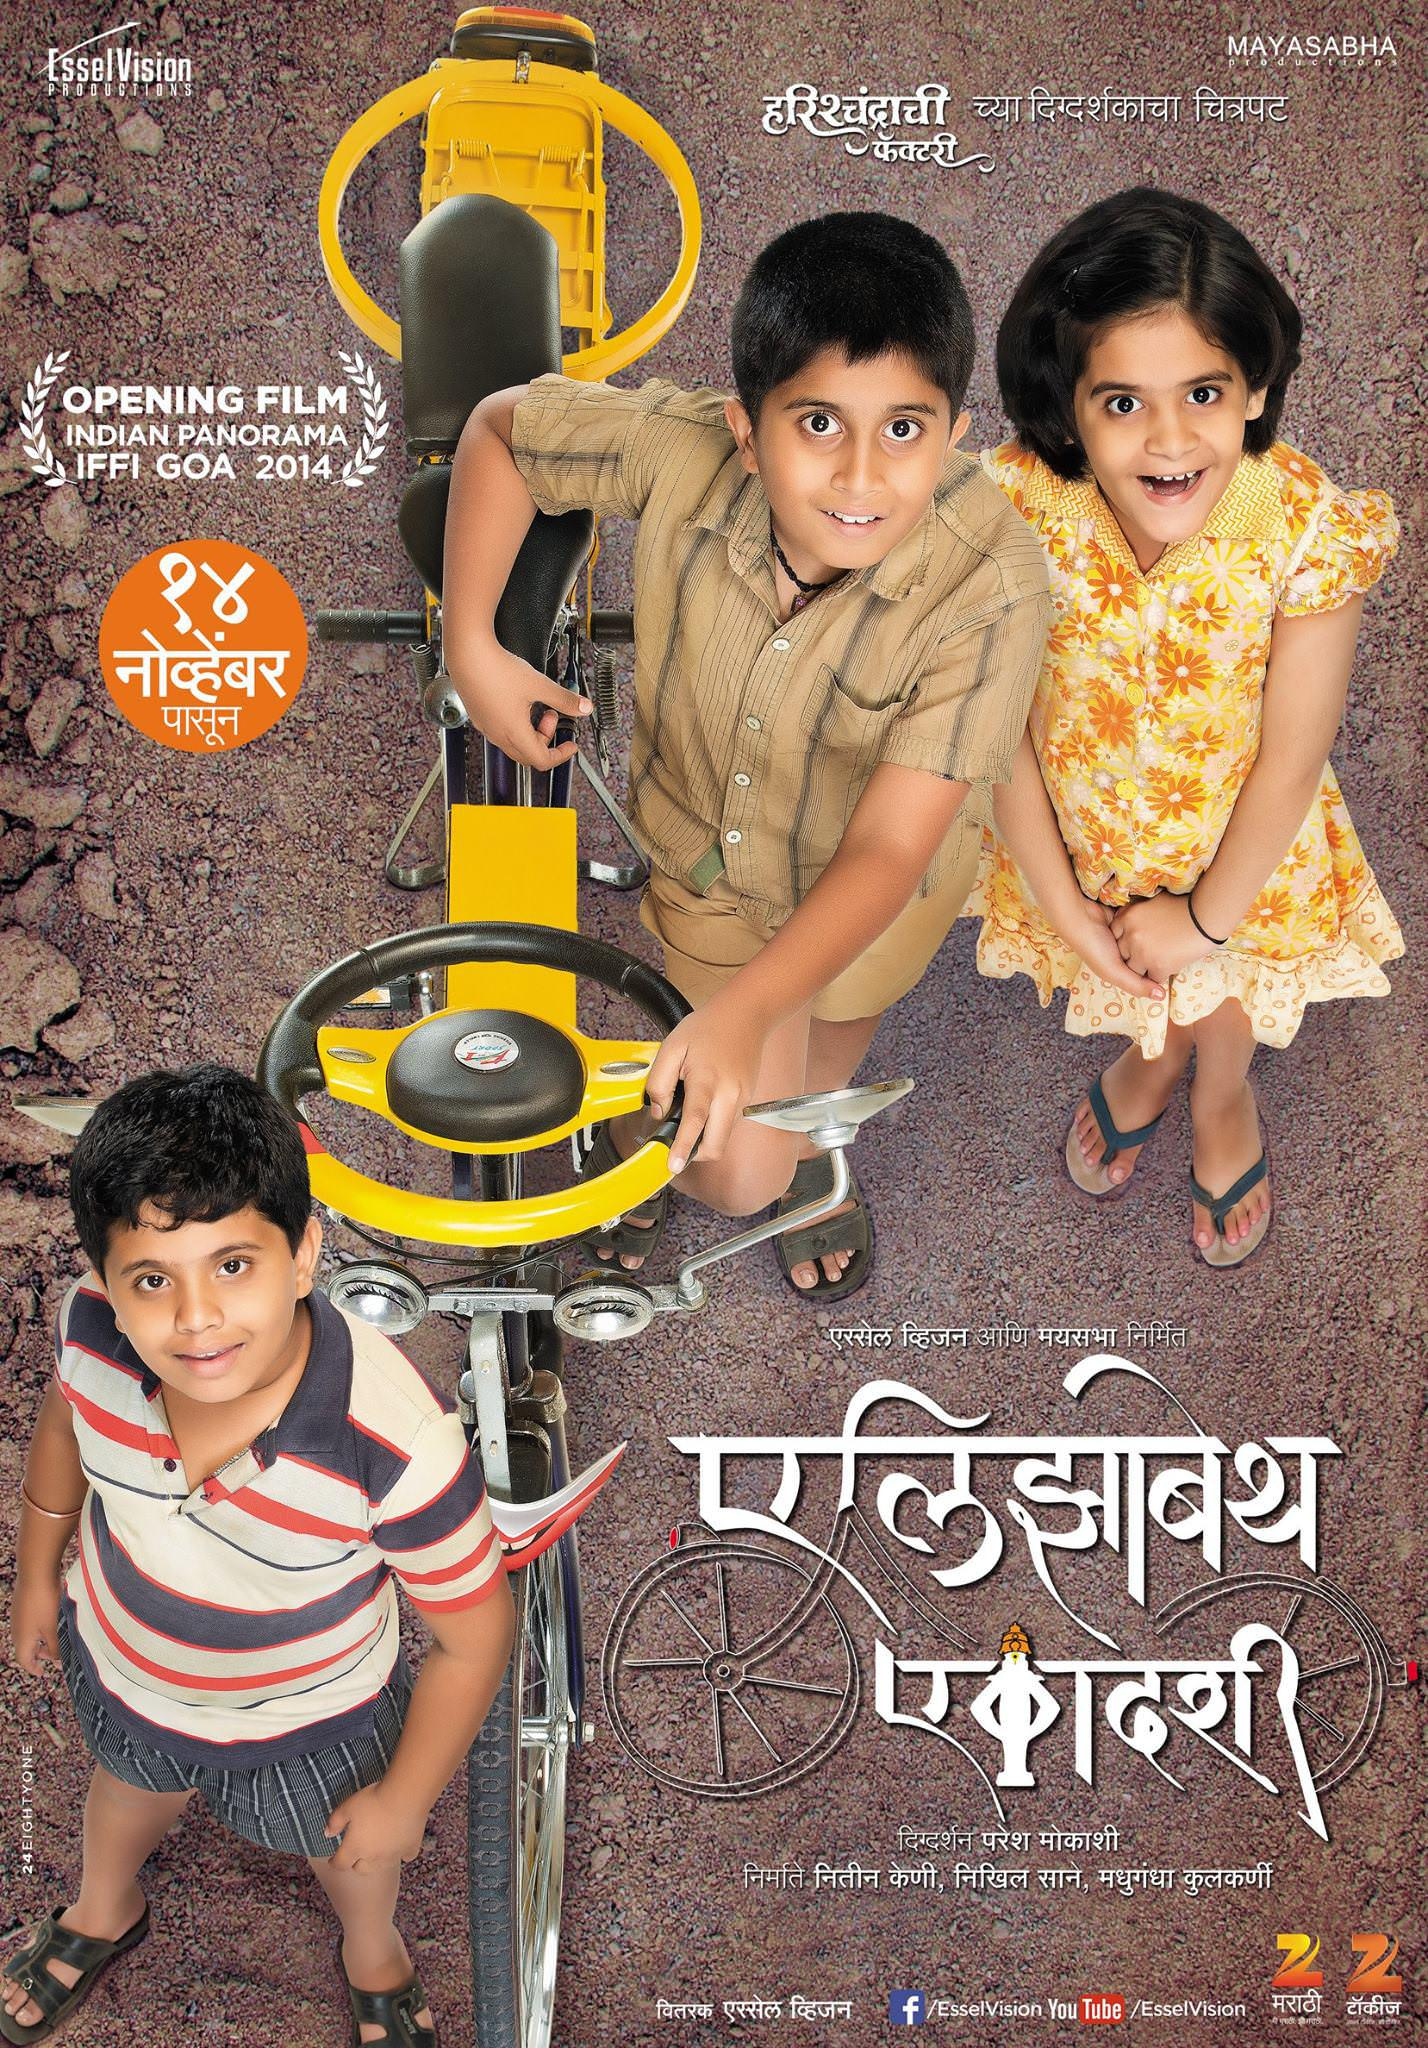 ⭐ Latest marathi movies download website list | Top 45+